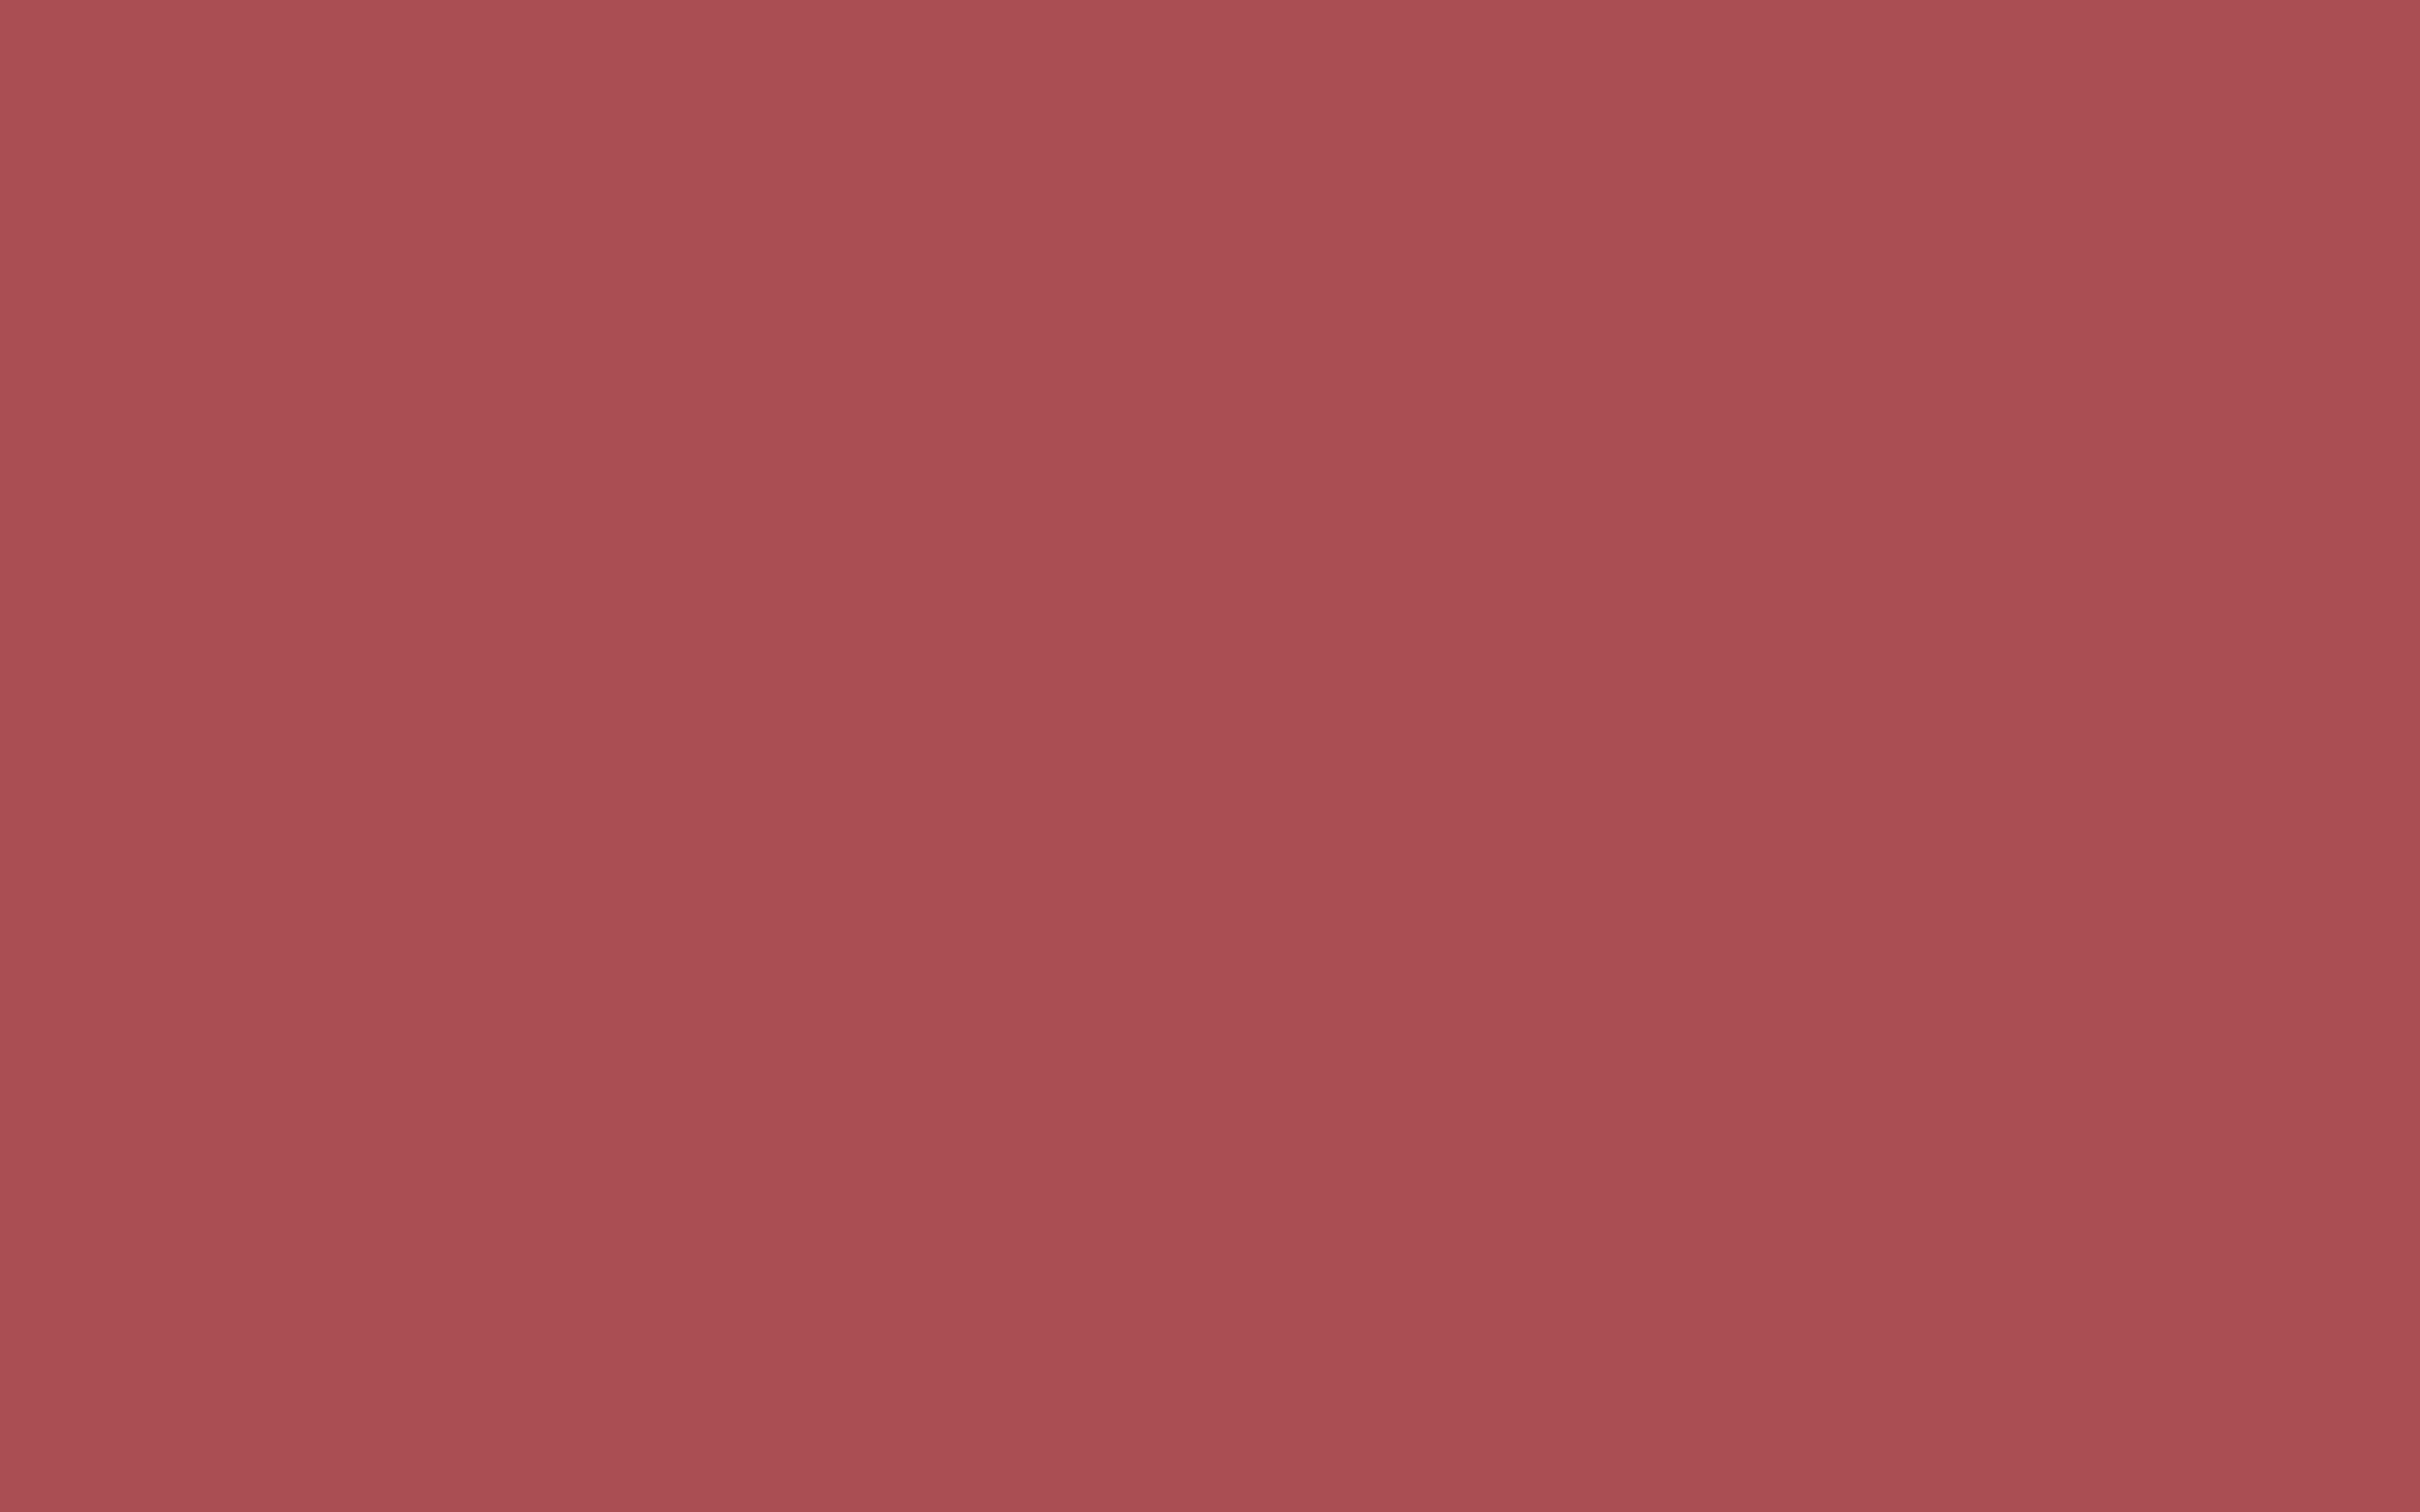 2560x1600 Rose Vale Solid Color Background